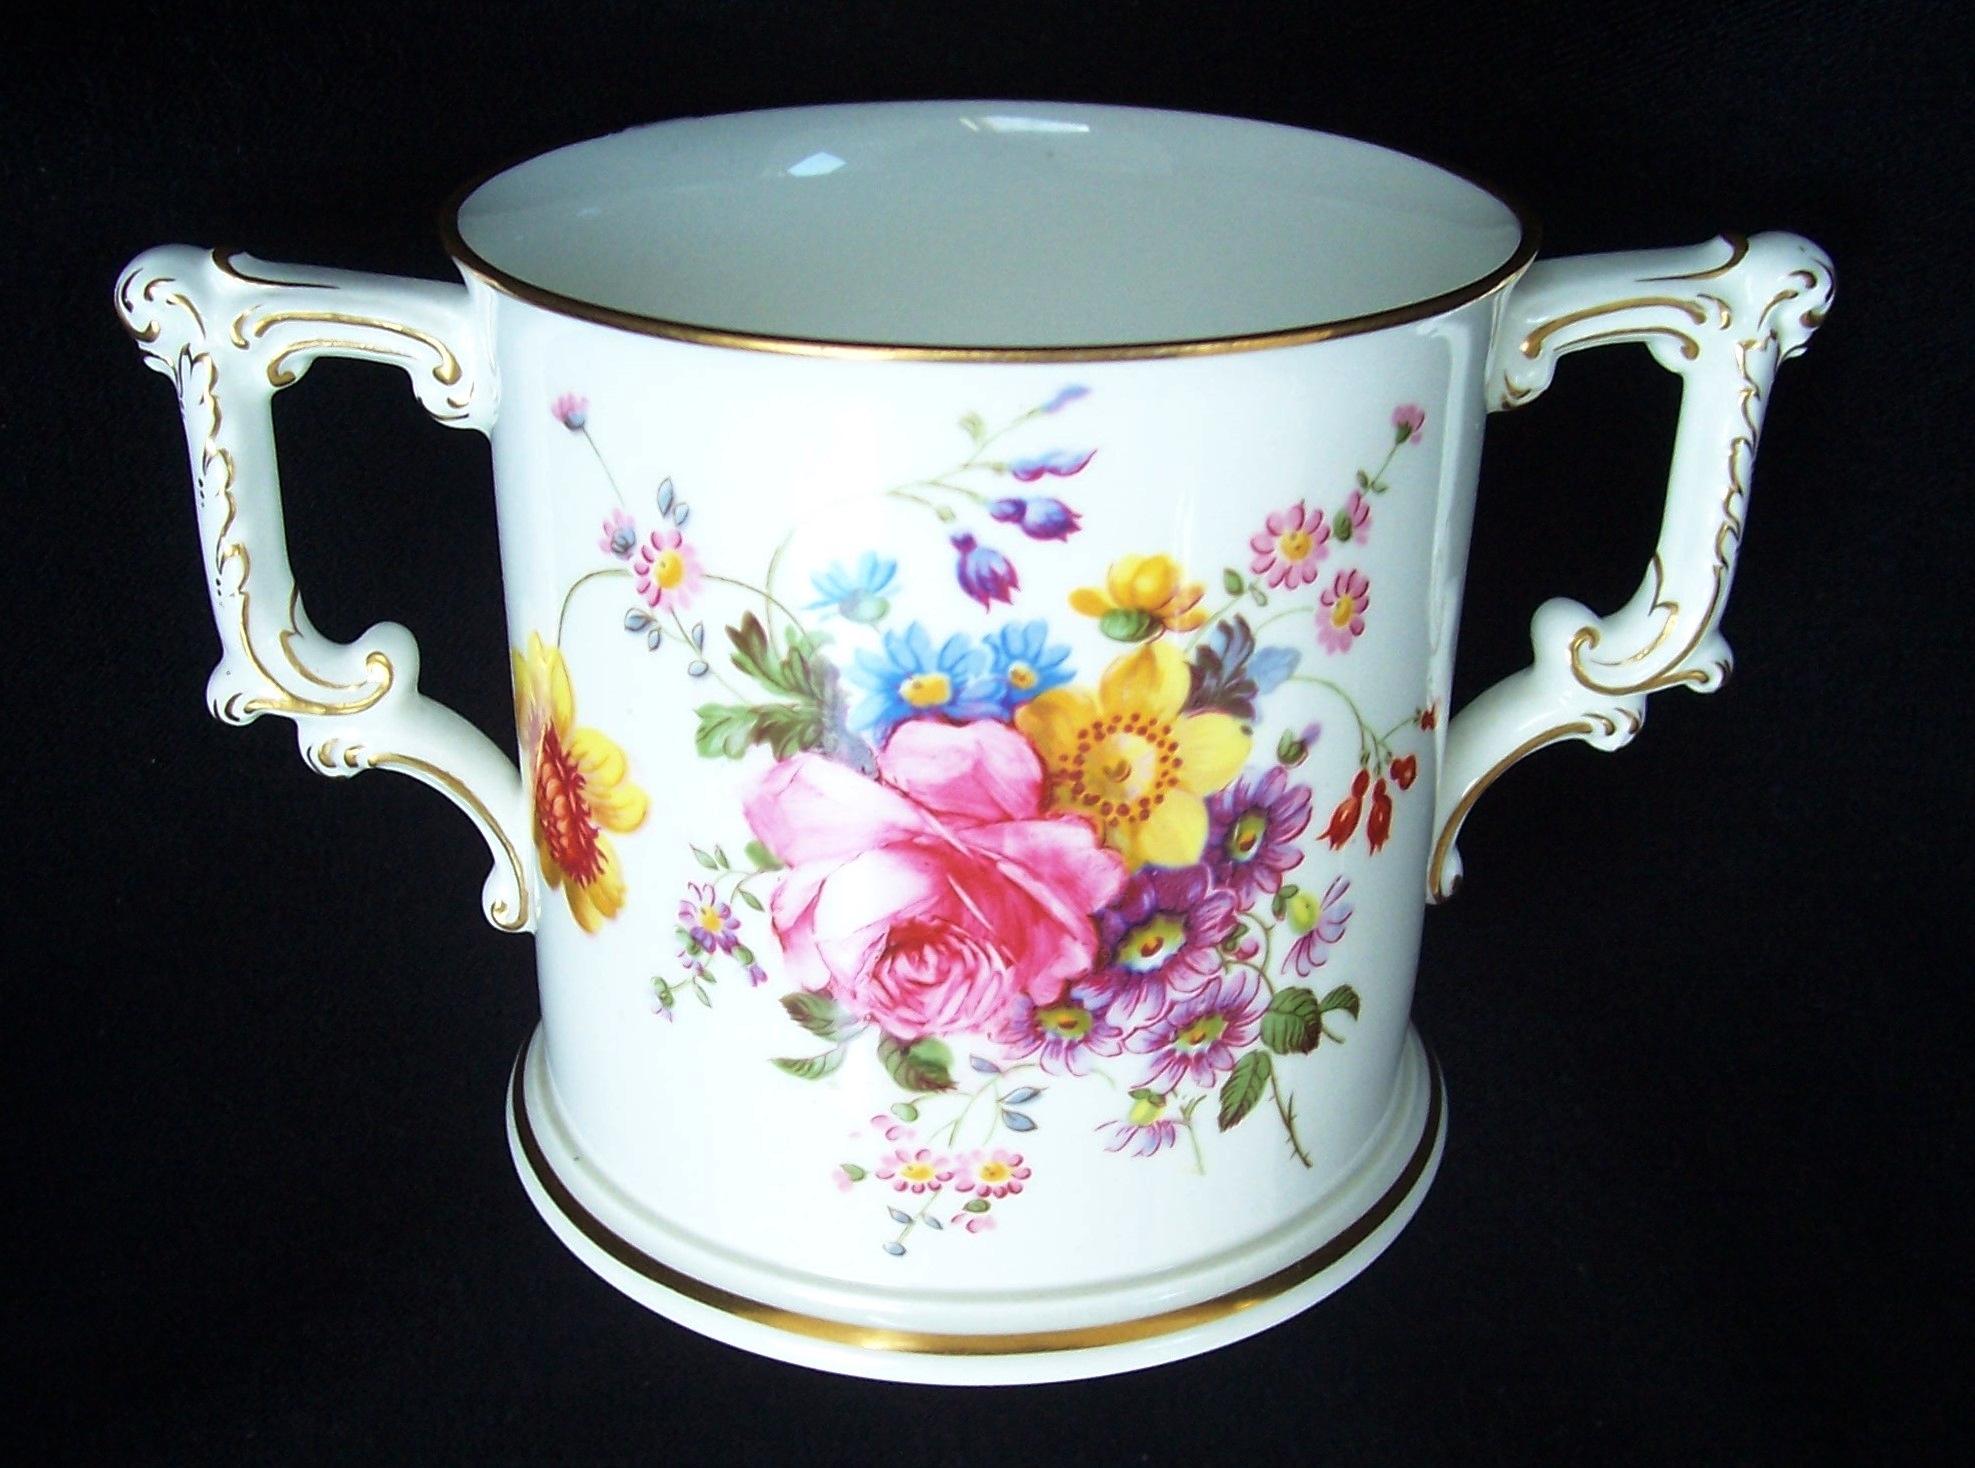 royal-crown-derby-allestree-british-legion-loving-cup-tom-and-edith-sis-rawlings